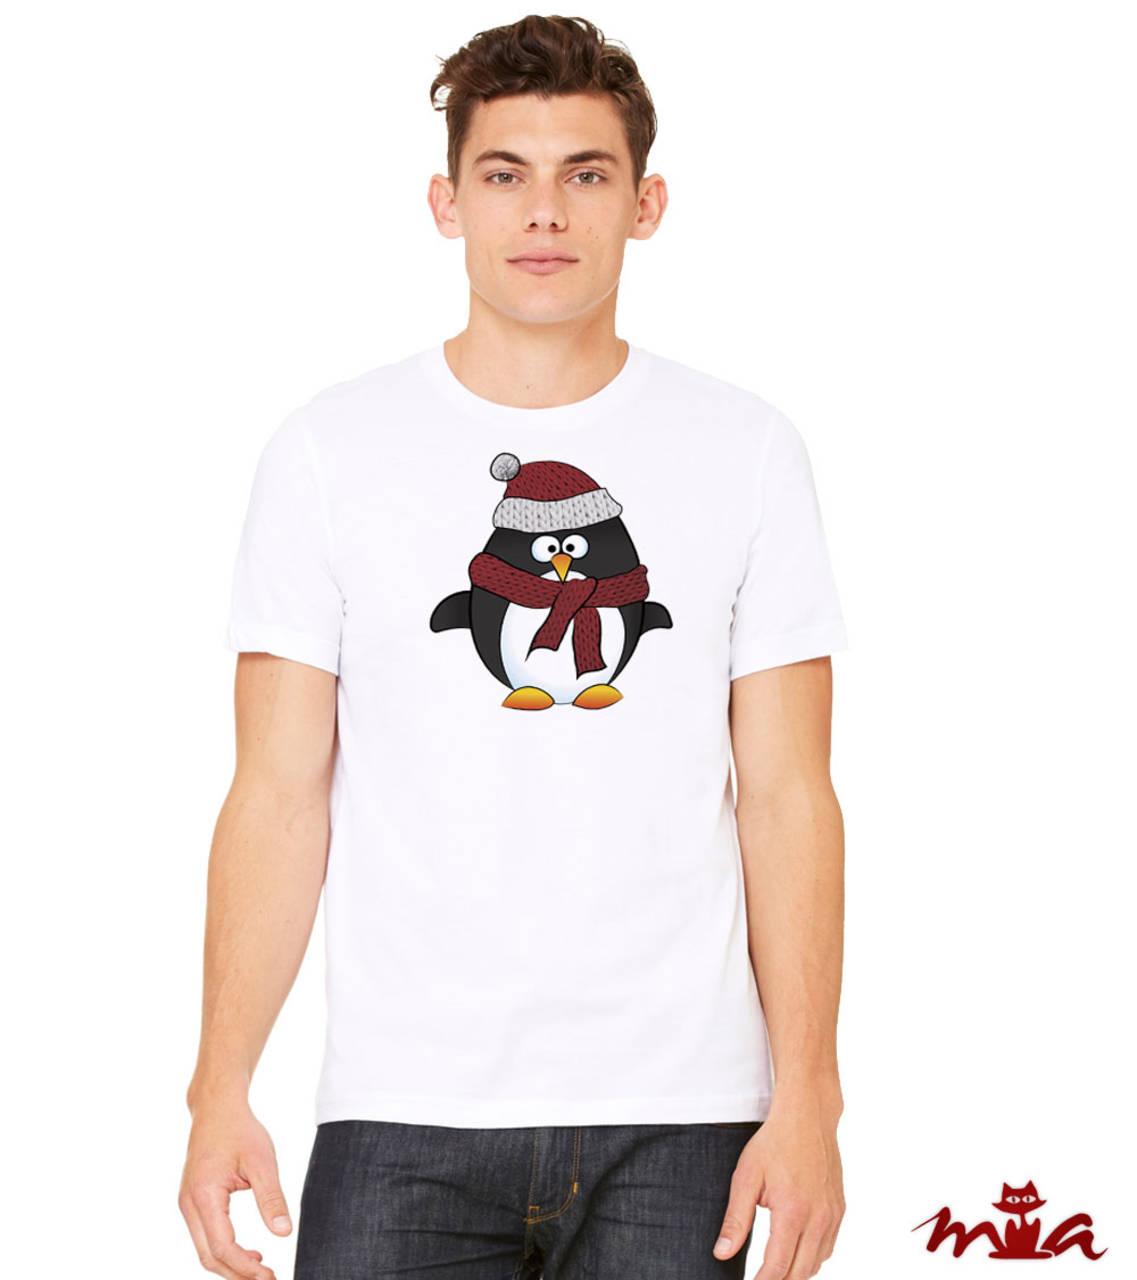 dbe5b918582 Pánske tričko - Penguin (rodinné oblečenie) (krátkorukávové ...